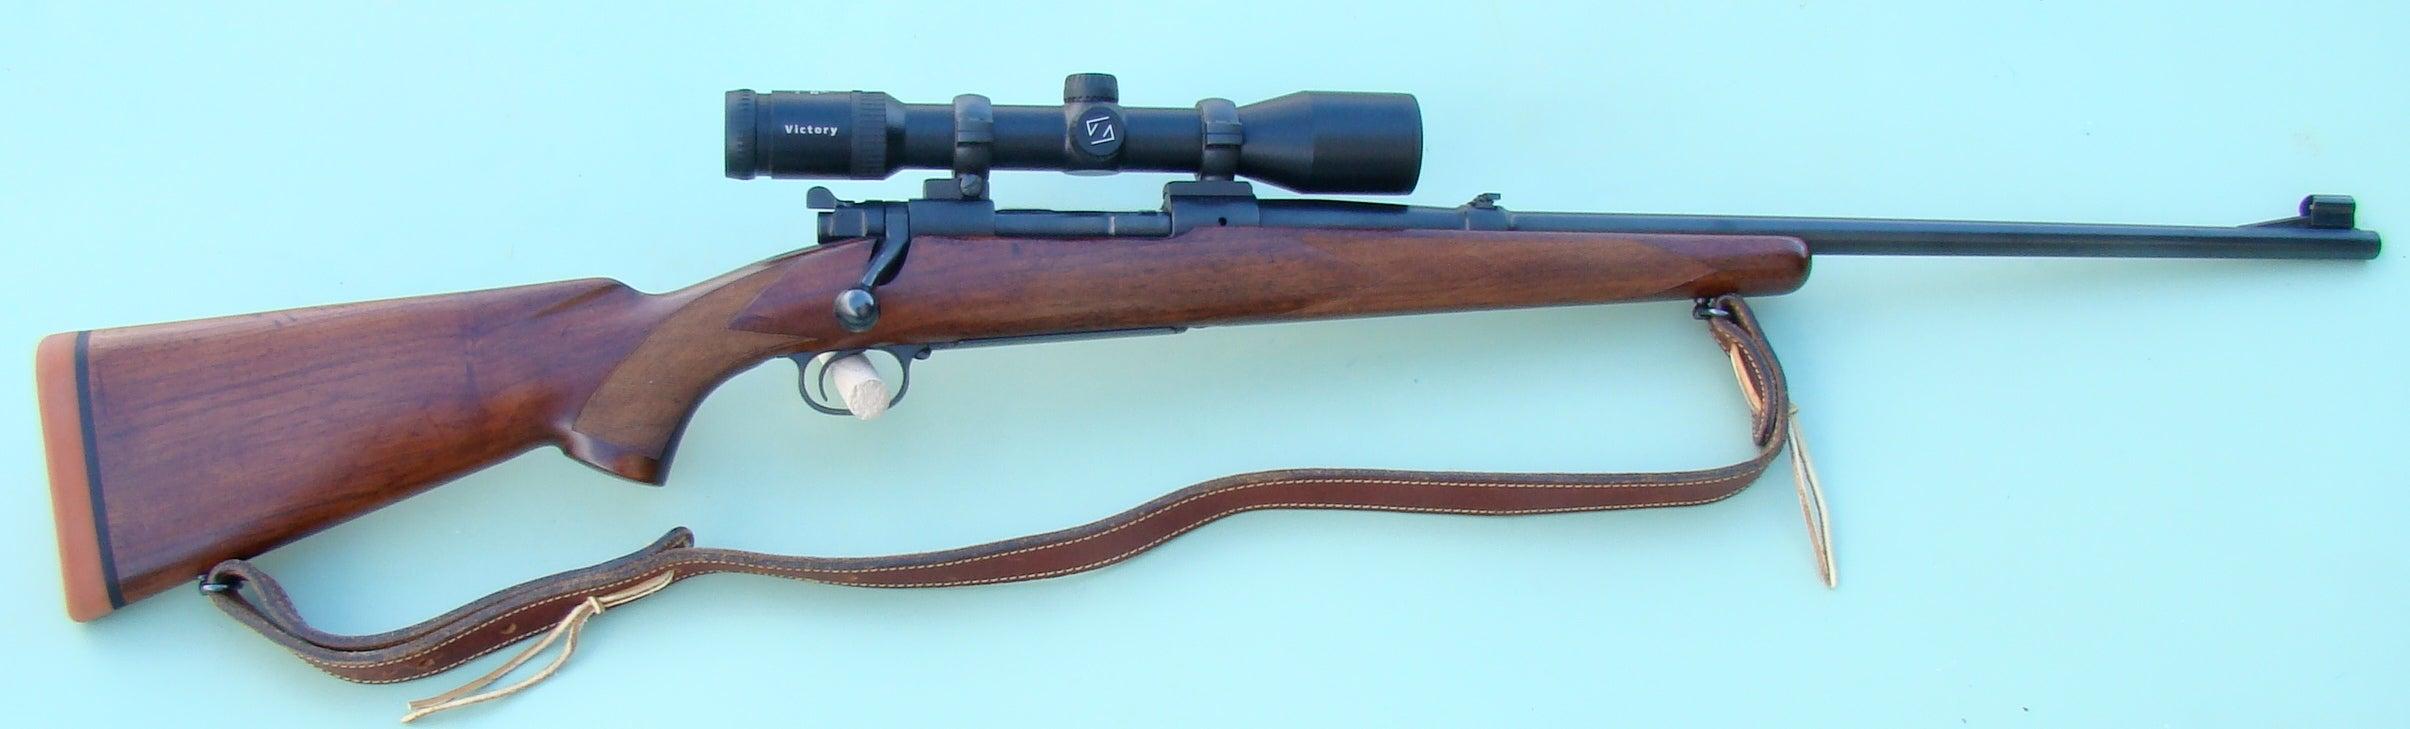 Gunfight Friday: Remington 7600 vs. Winchester Model 70